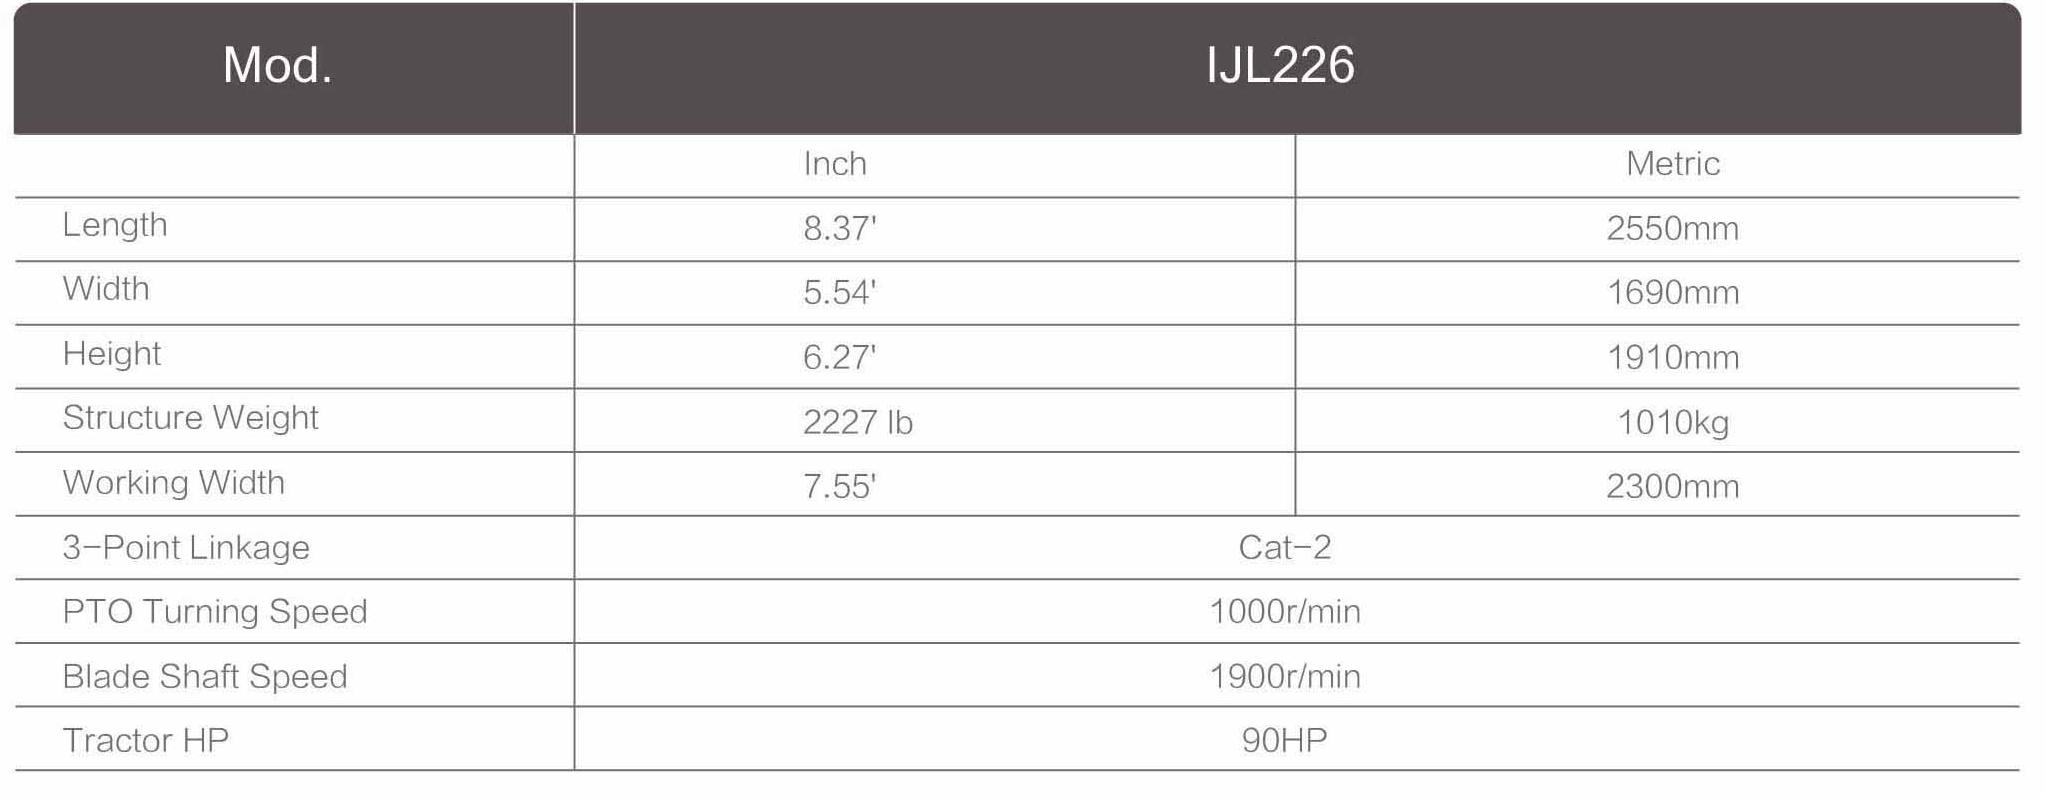 1JL226 tab - Лесной и парковый мульчер1JL226.  DOBERKMET